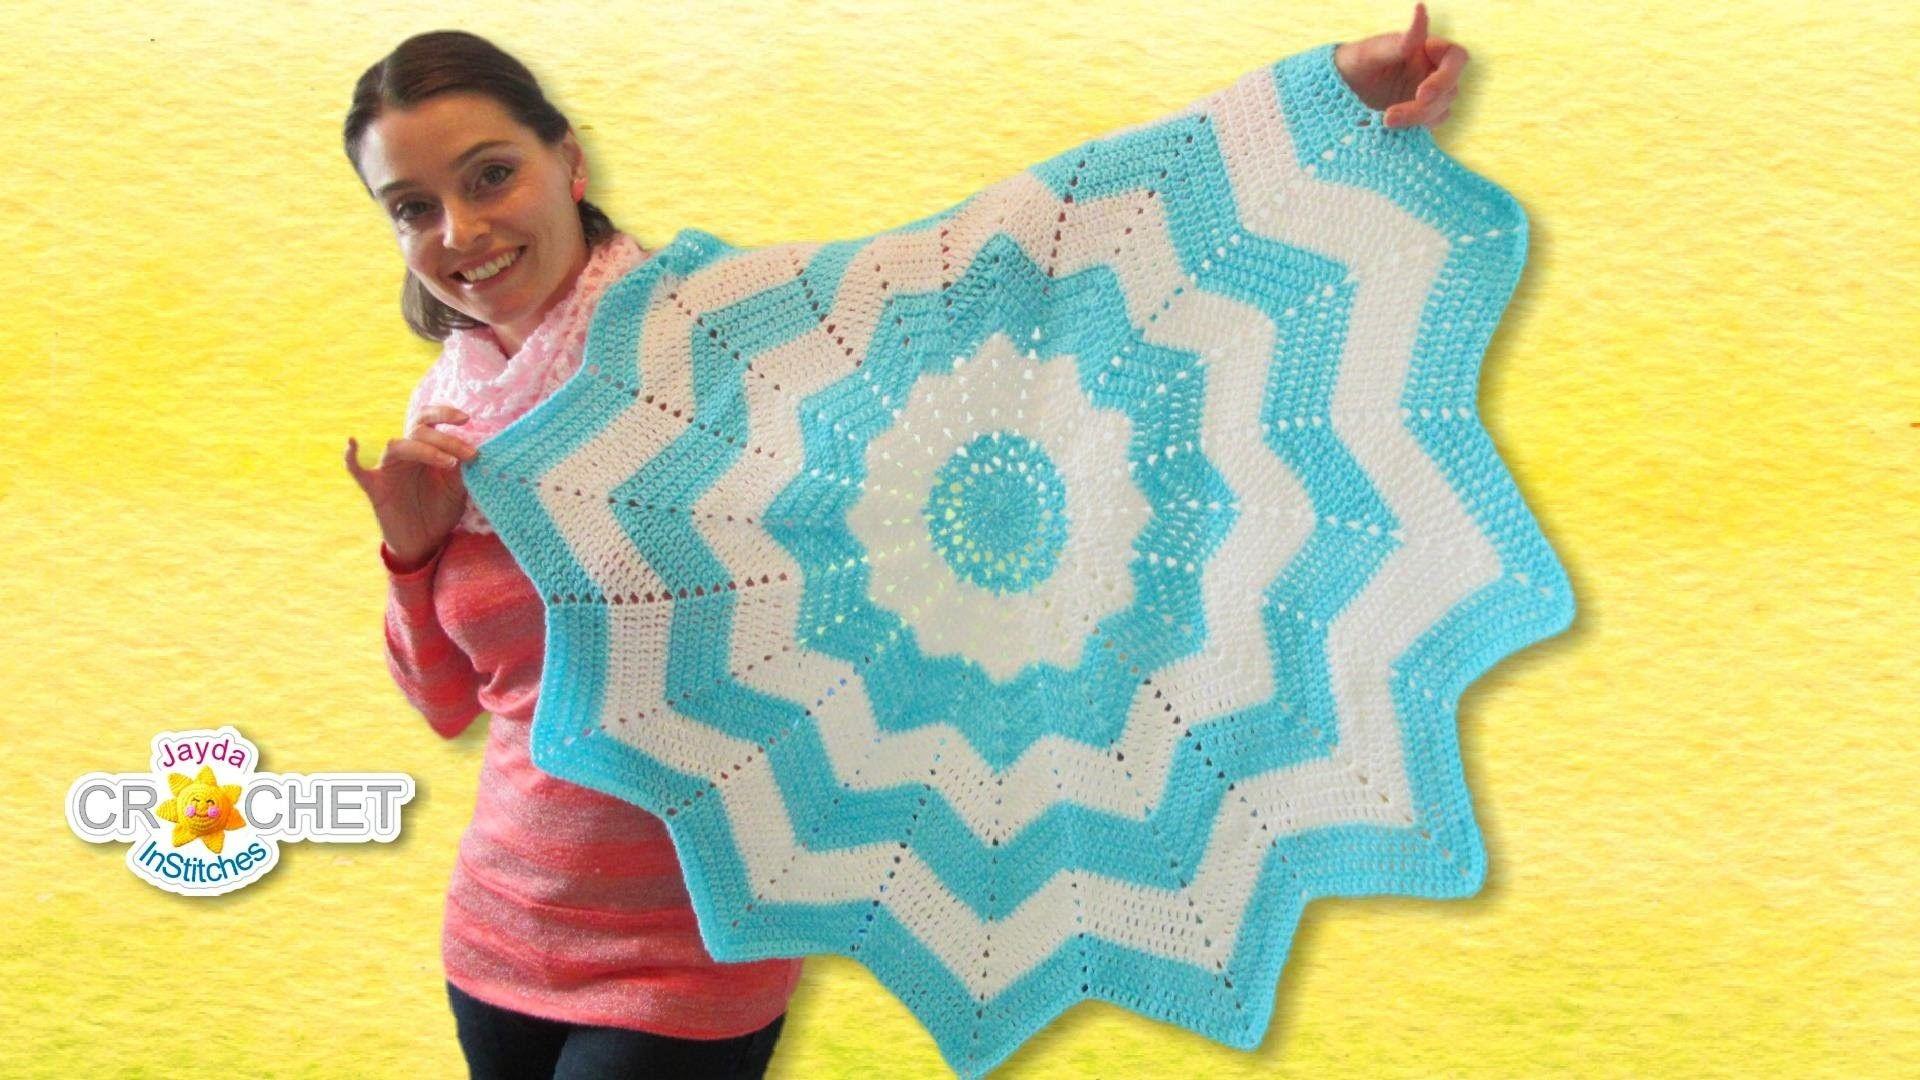 Classic Round Ripple Crochet Baby Blanket - Sunburst Pattern